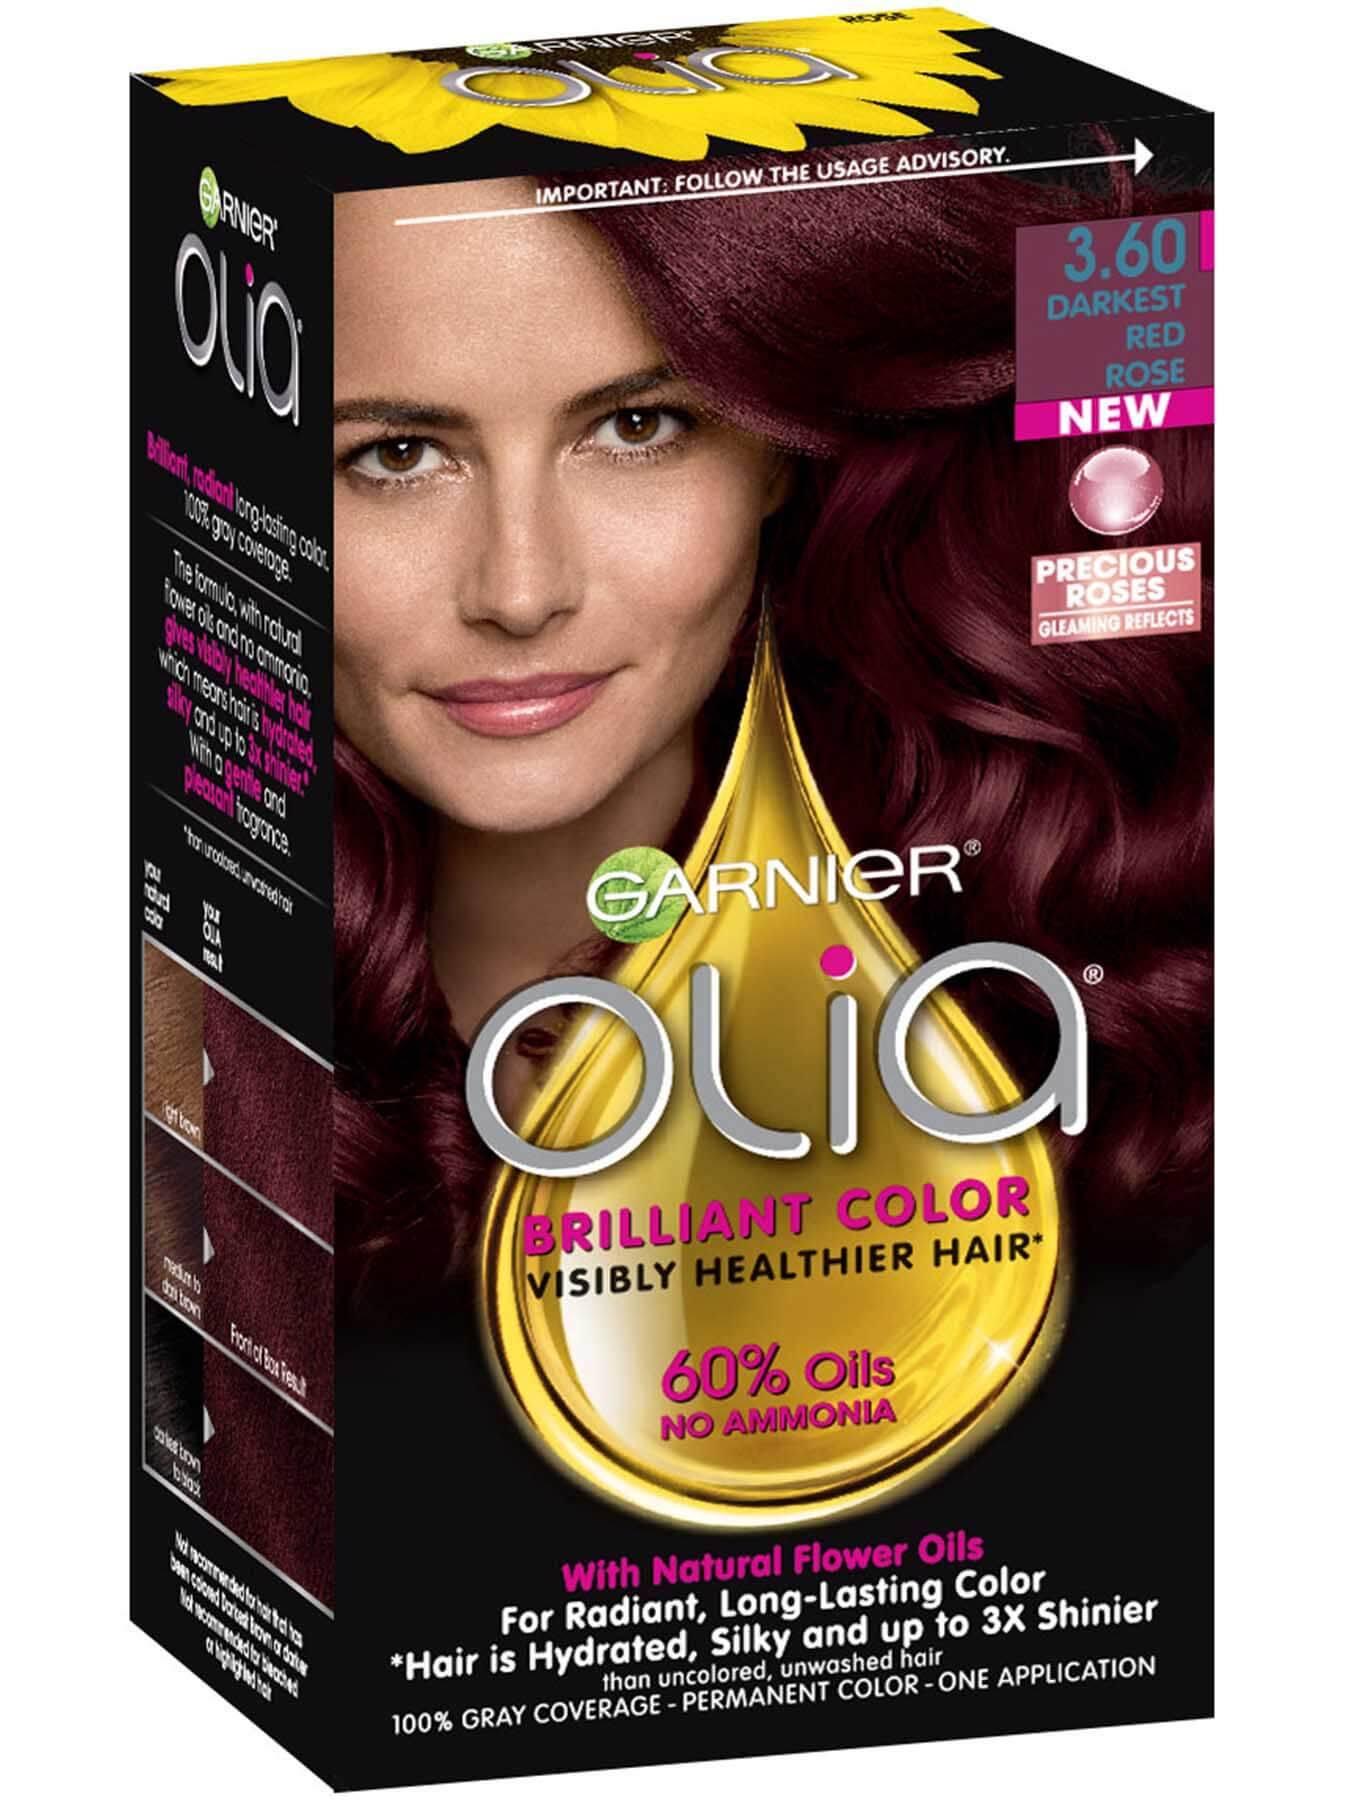 Olia Darkest Red Rose Hair Color Ammonia Free Hair Dye Garnier